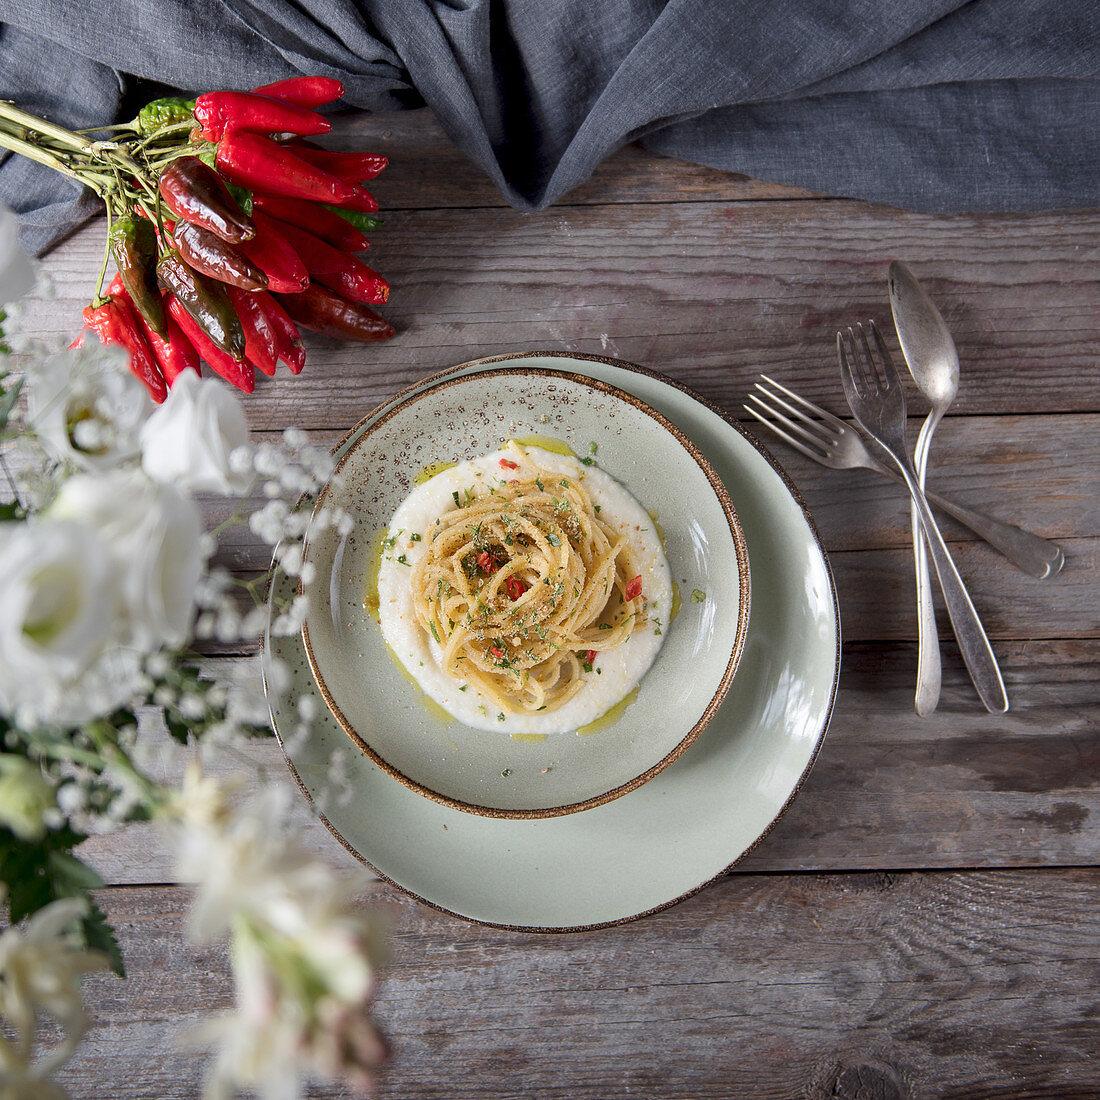 Spaghetti aglio olio e peperoncino on cauliflower foam